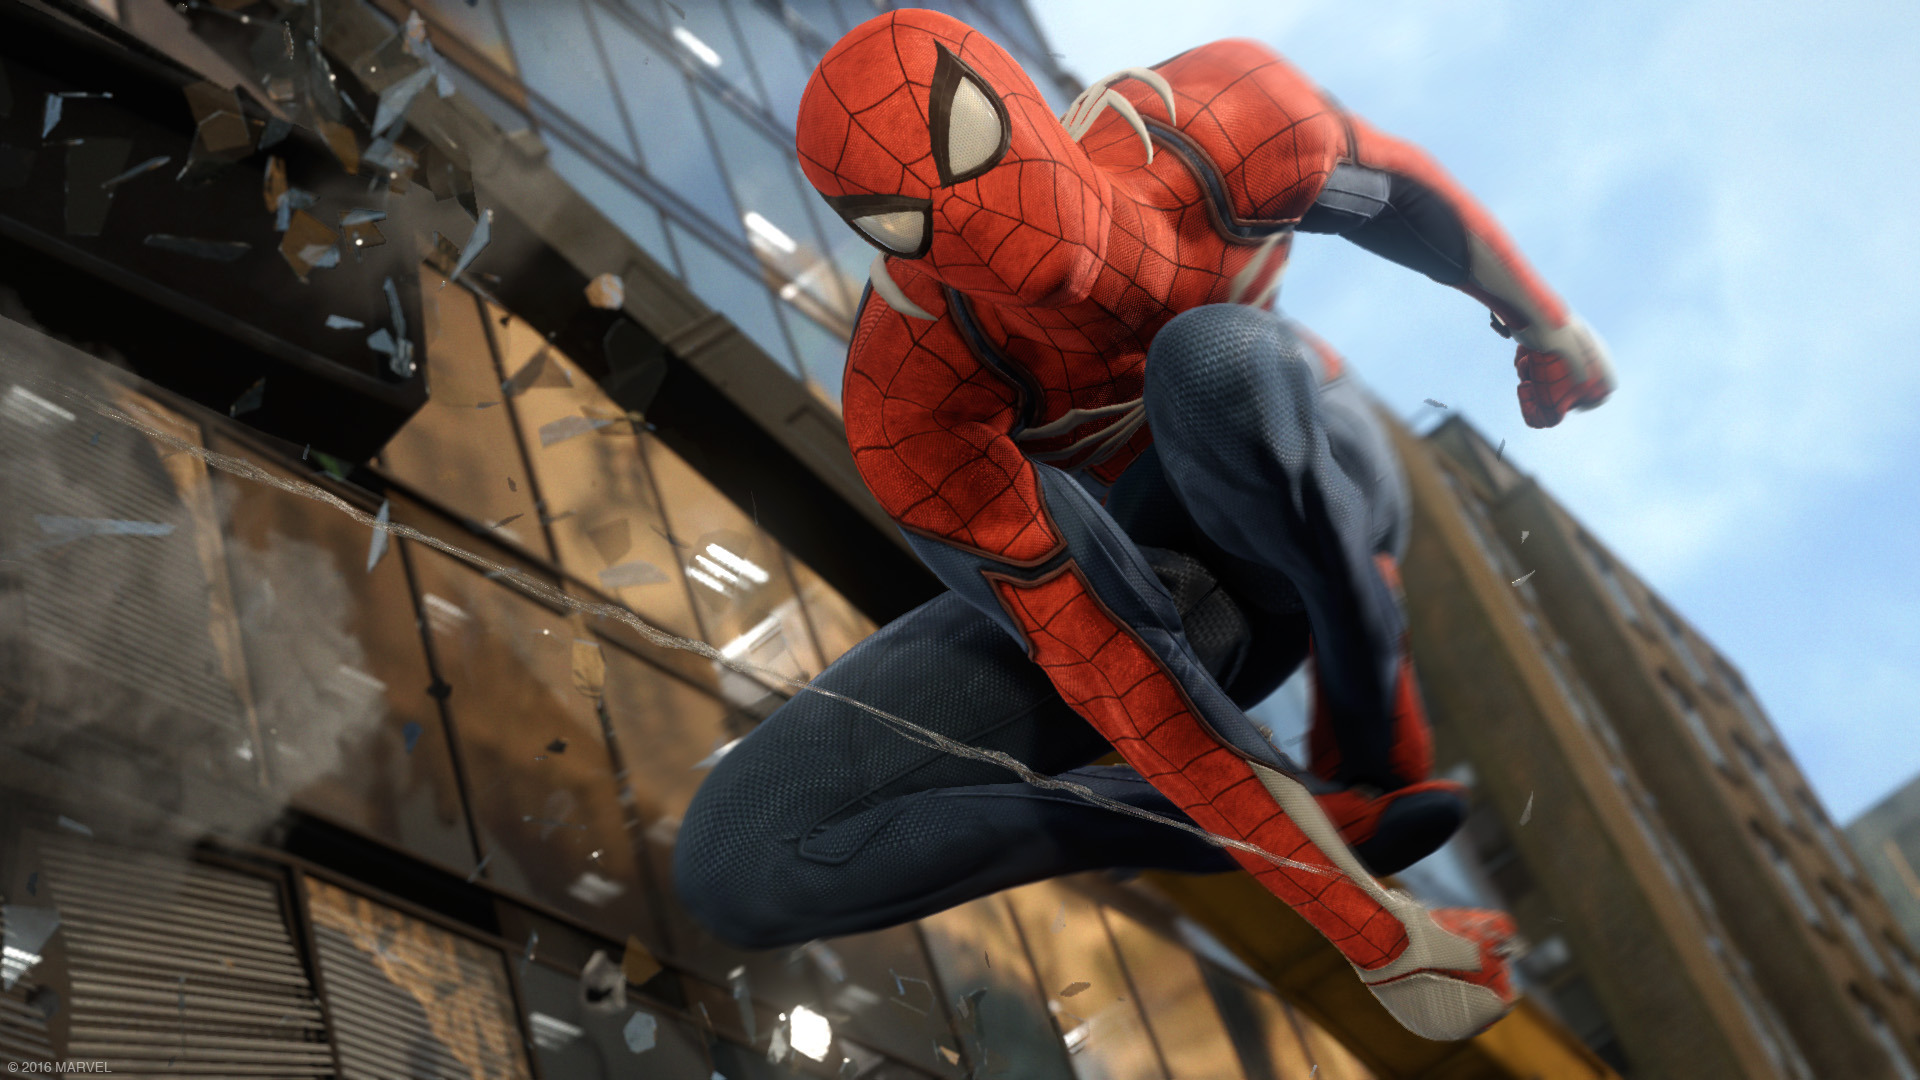 Spiderman - PS4 Pro - GameSoul